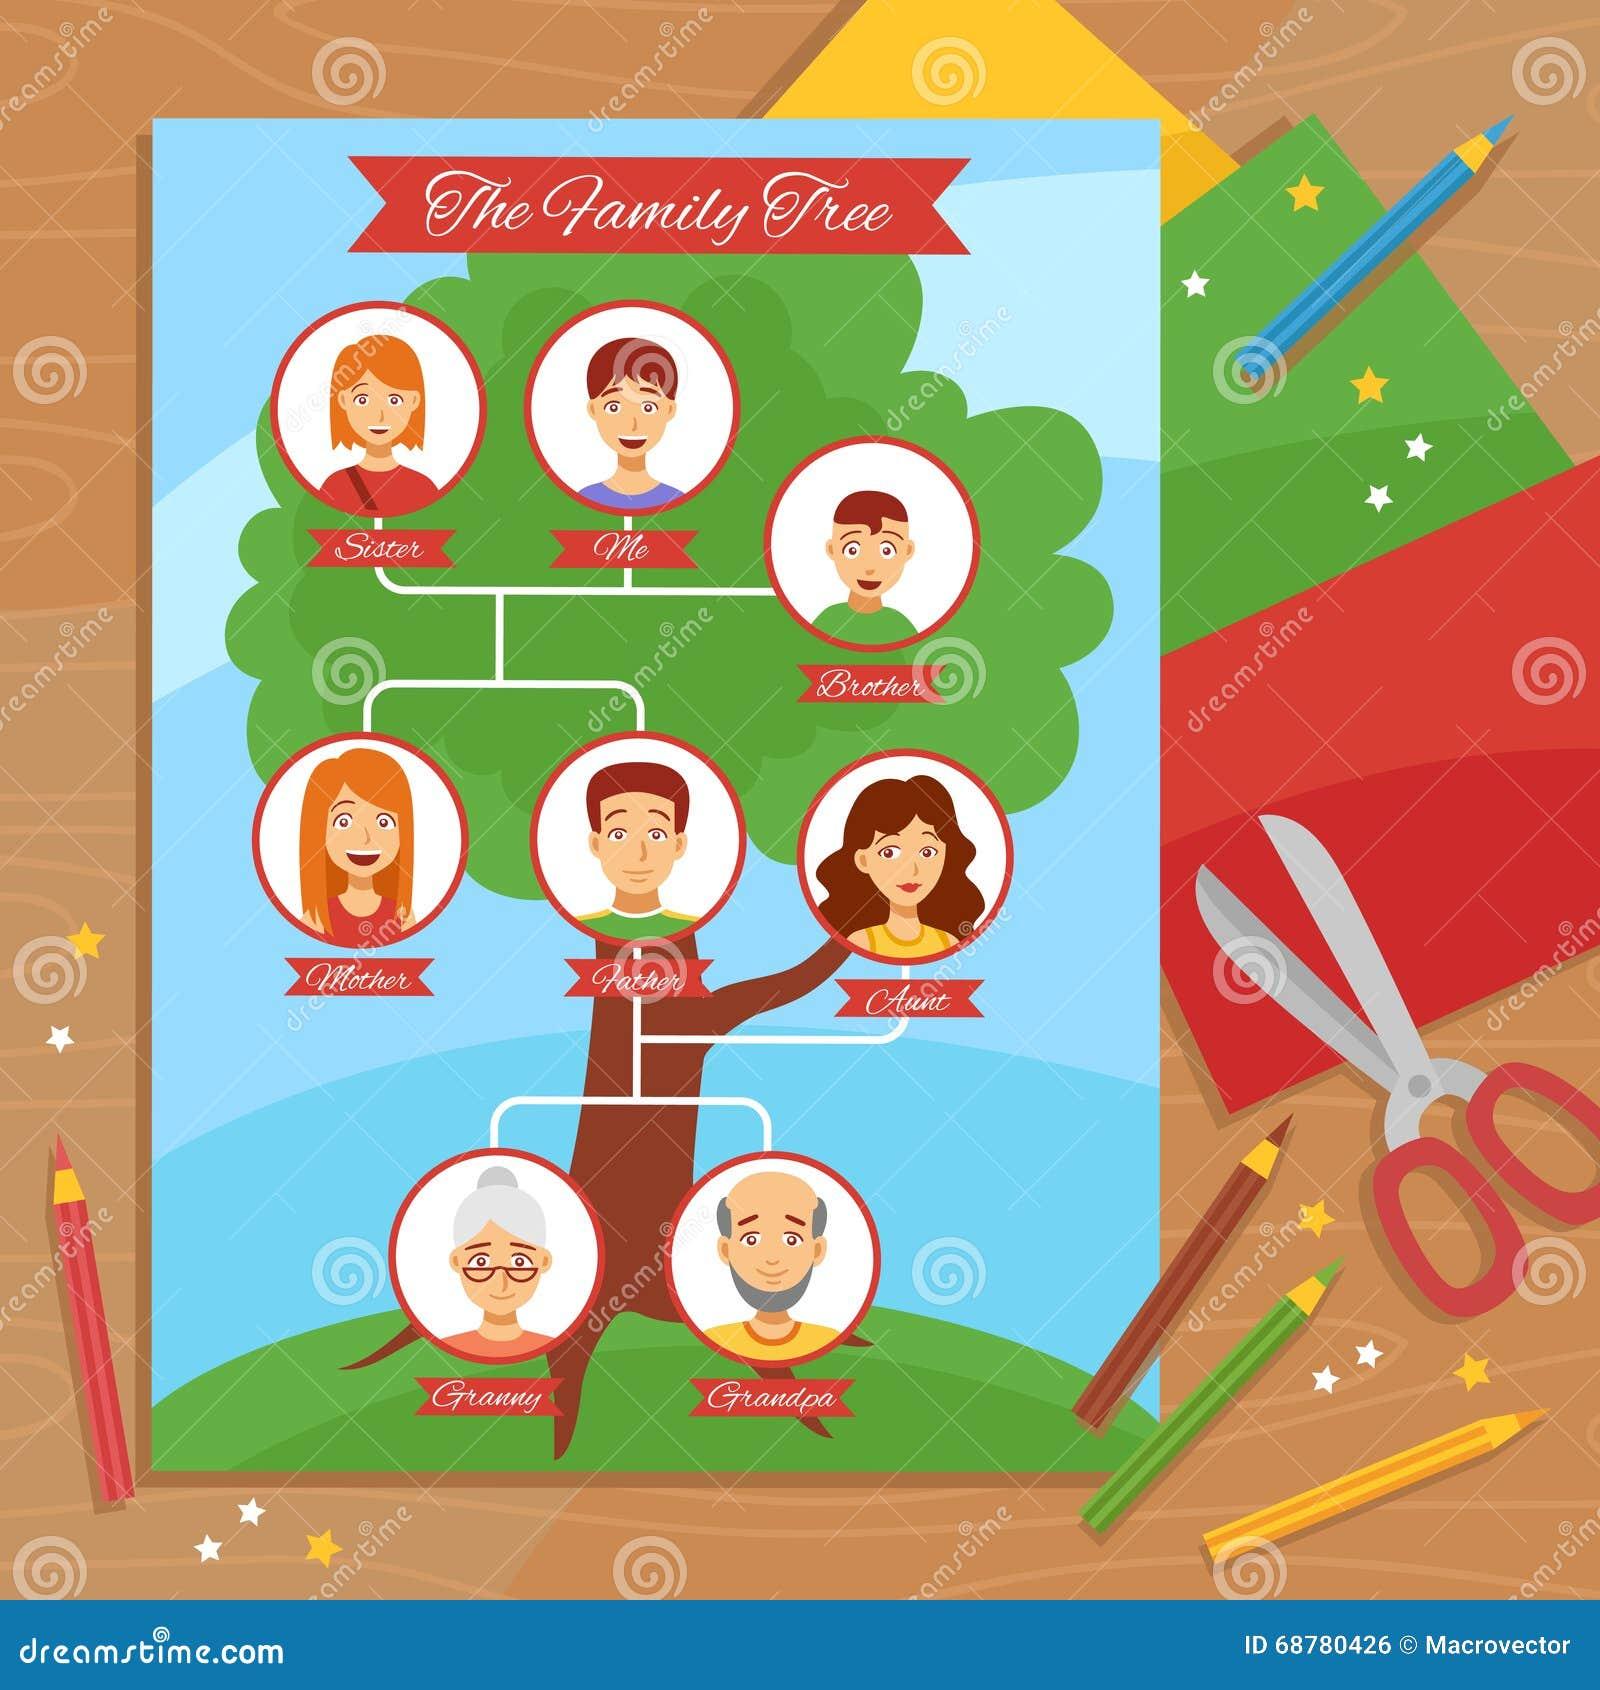 Family Tree Creative Handwork Flat Poster Stock Vector ...